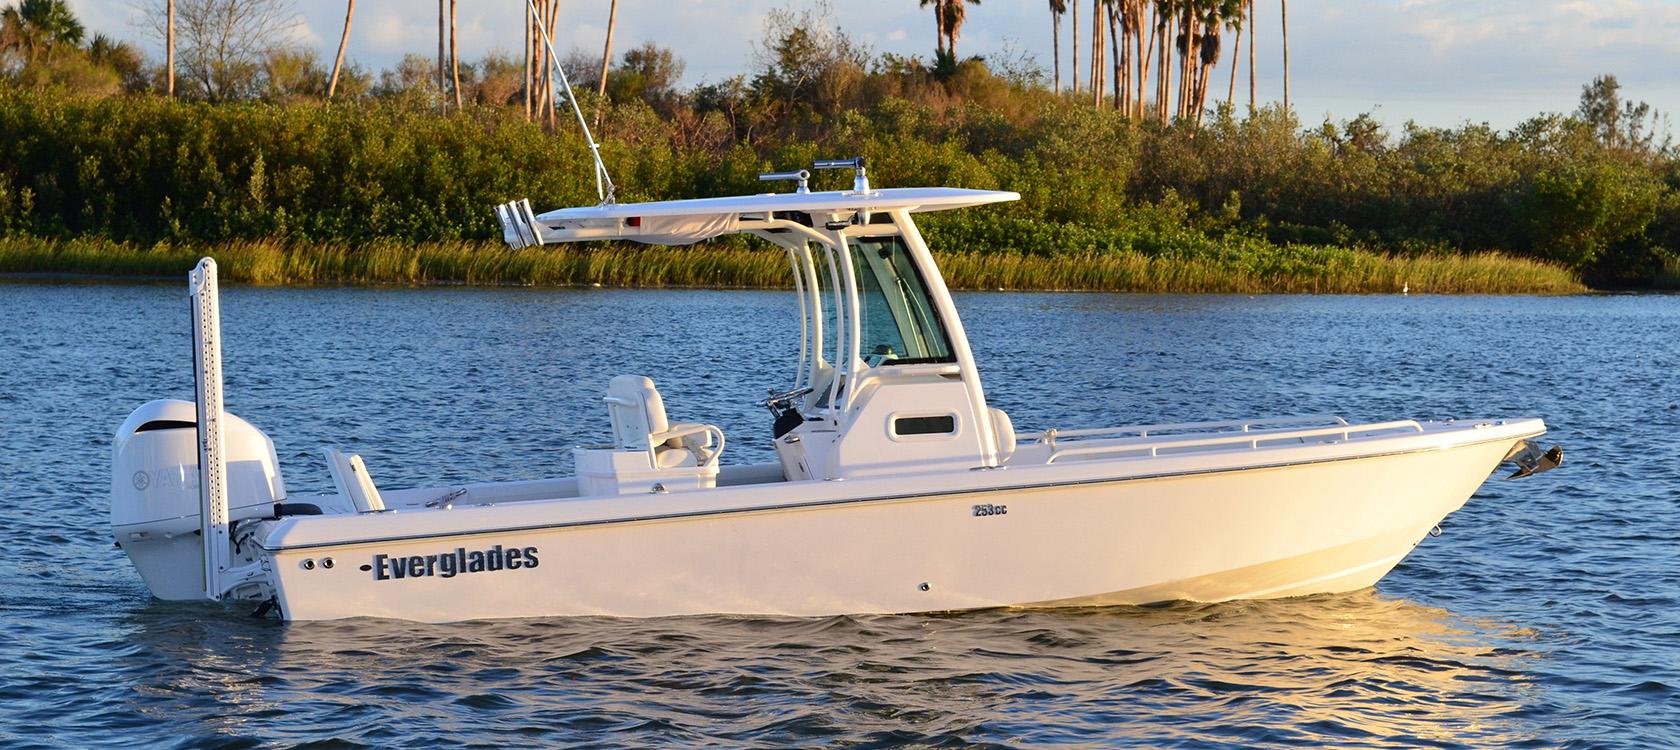 Everglades 253cc genetic engineering fishtalk magazine for Fishing in the everglades